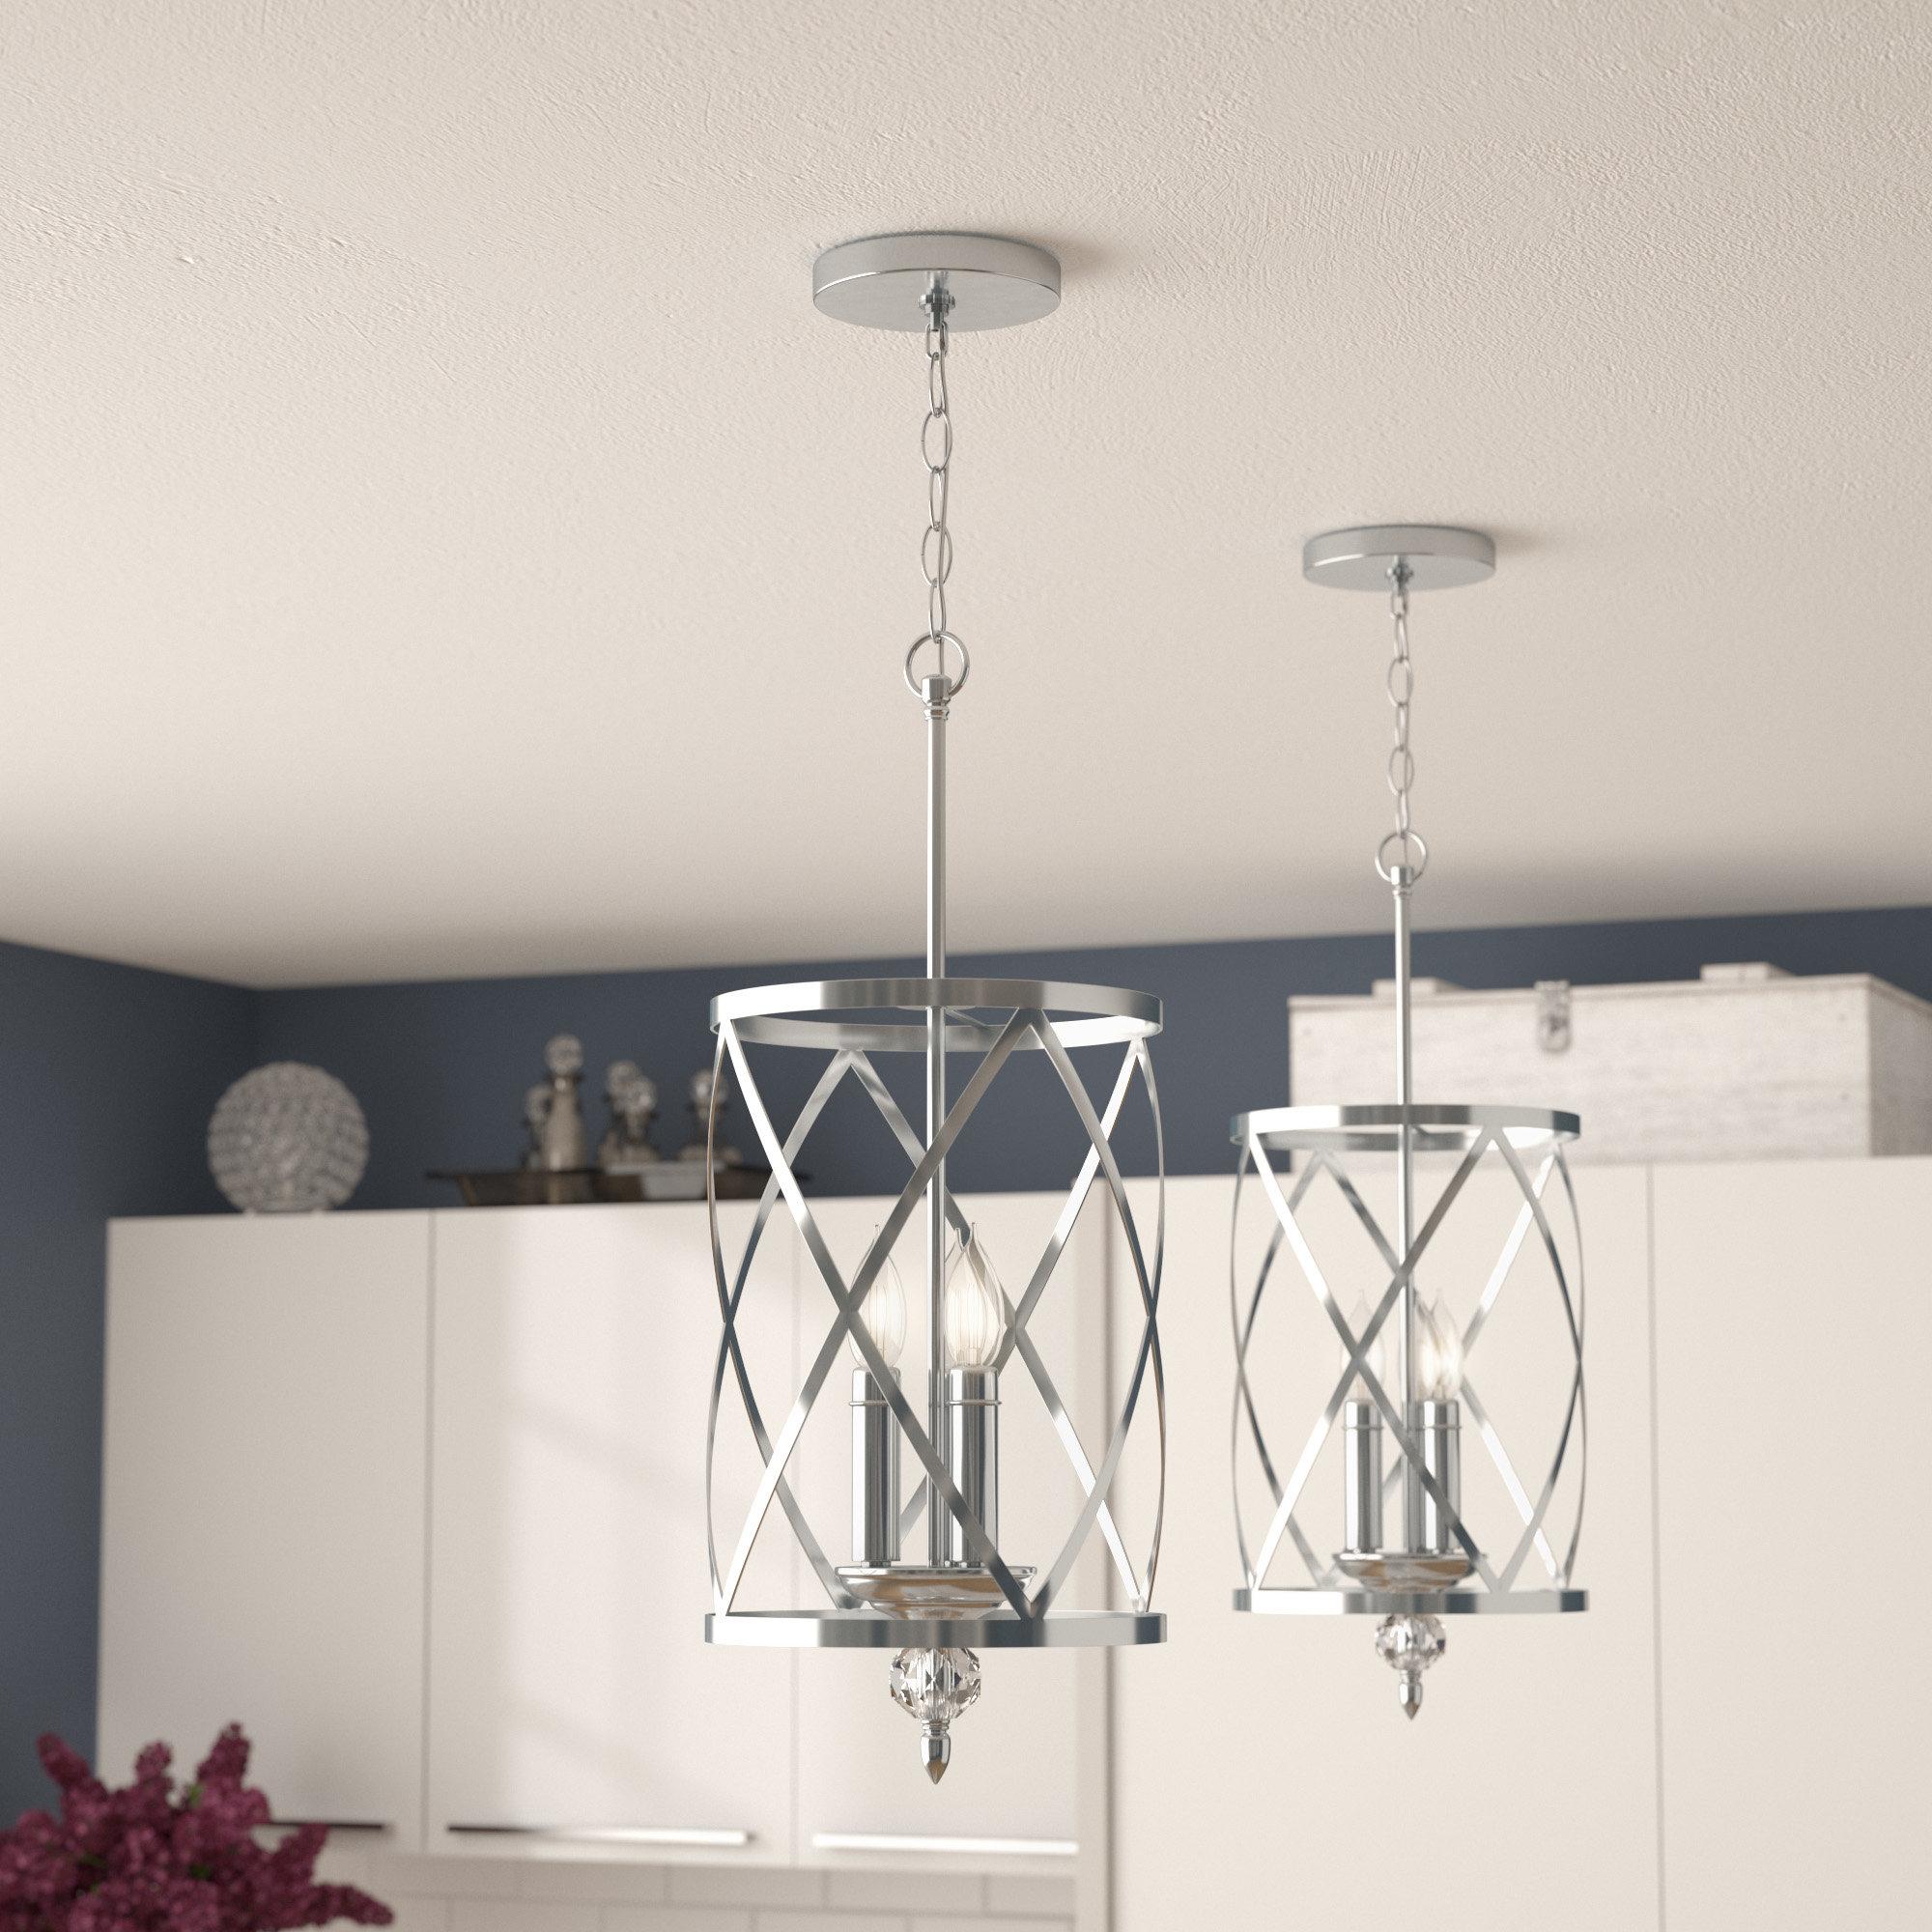 Newest Dirksen 3 Light Single Cylinder Chandeliers In Dirksen 3 Light Lantern Pendant (View 12 of 20)